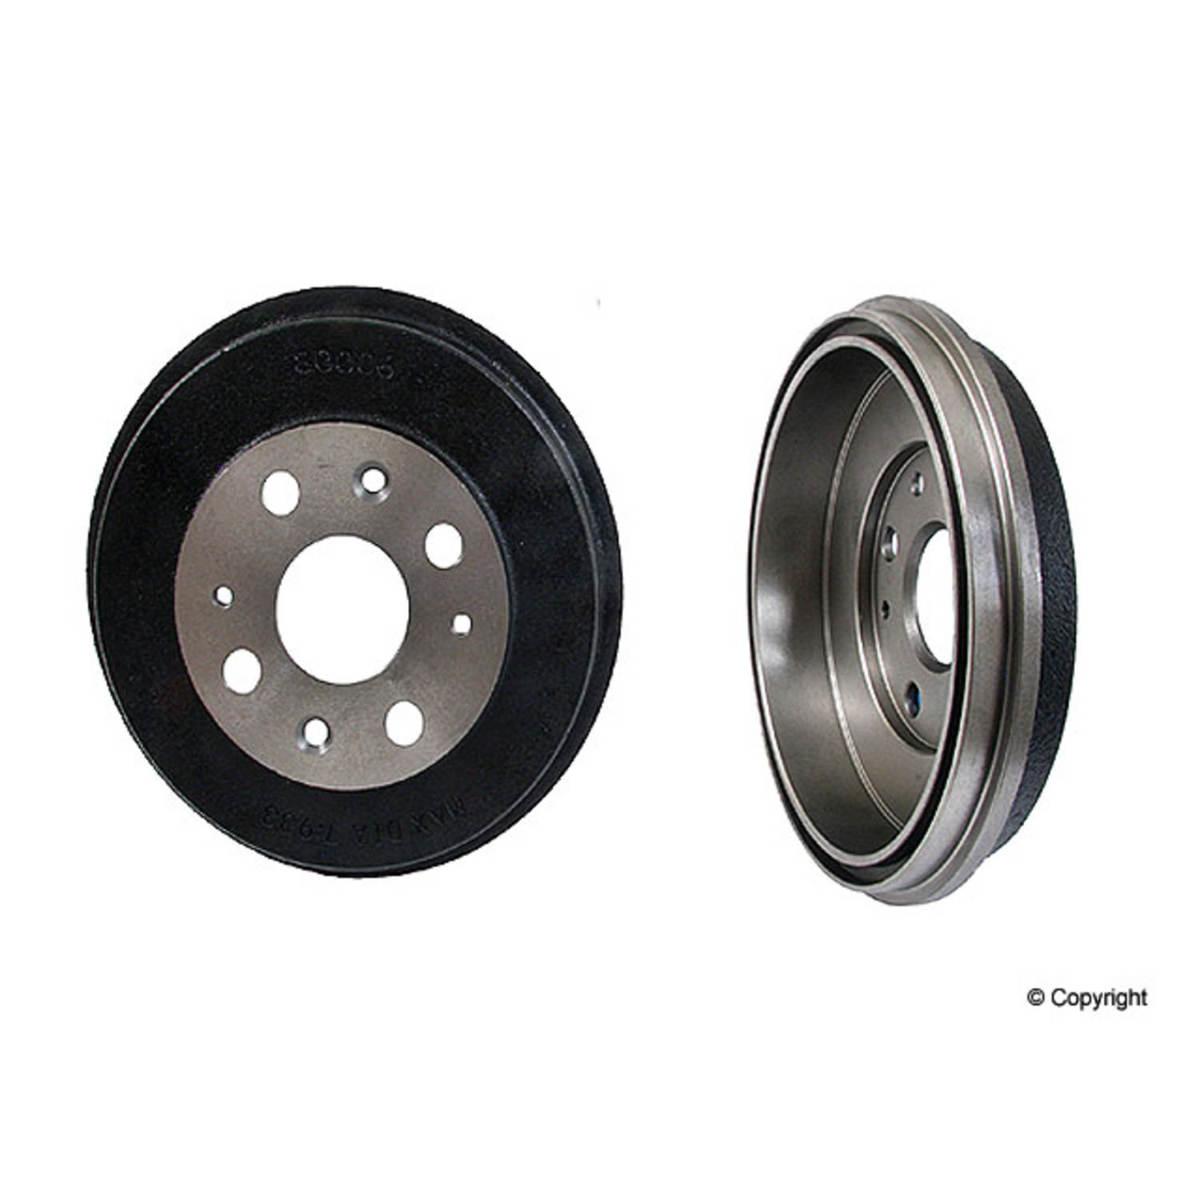 Original Performance Parts   Metal 40551178